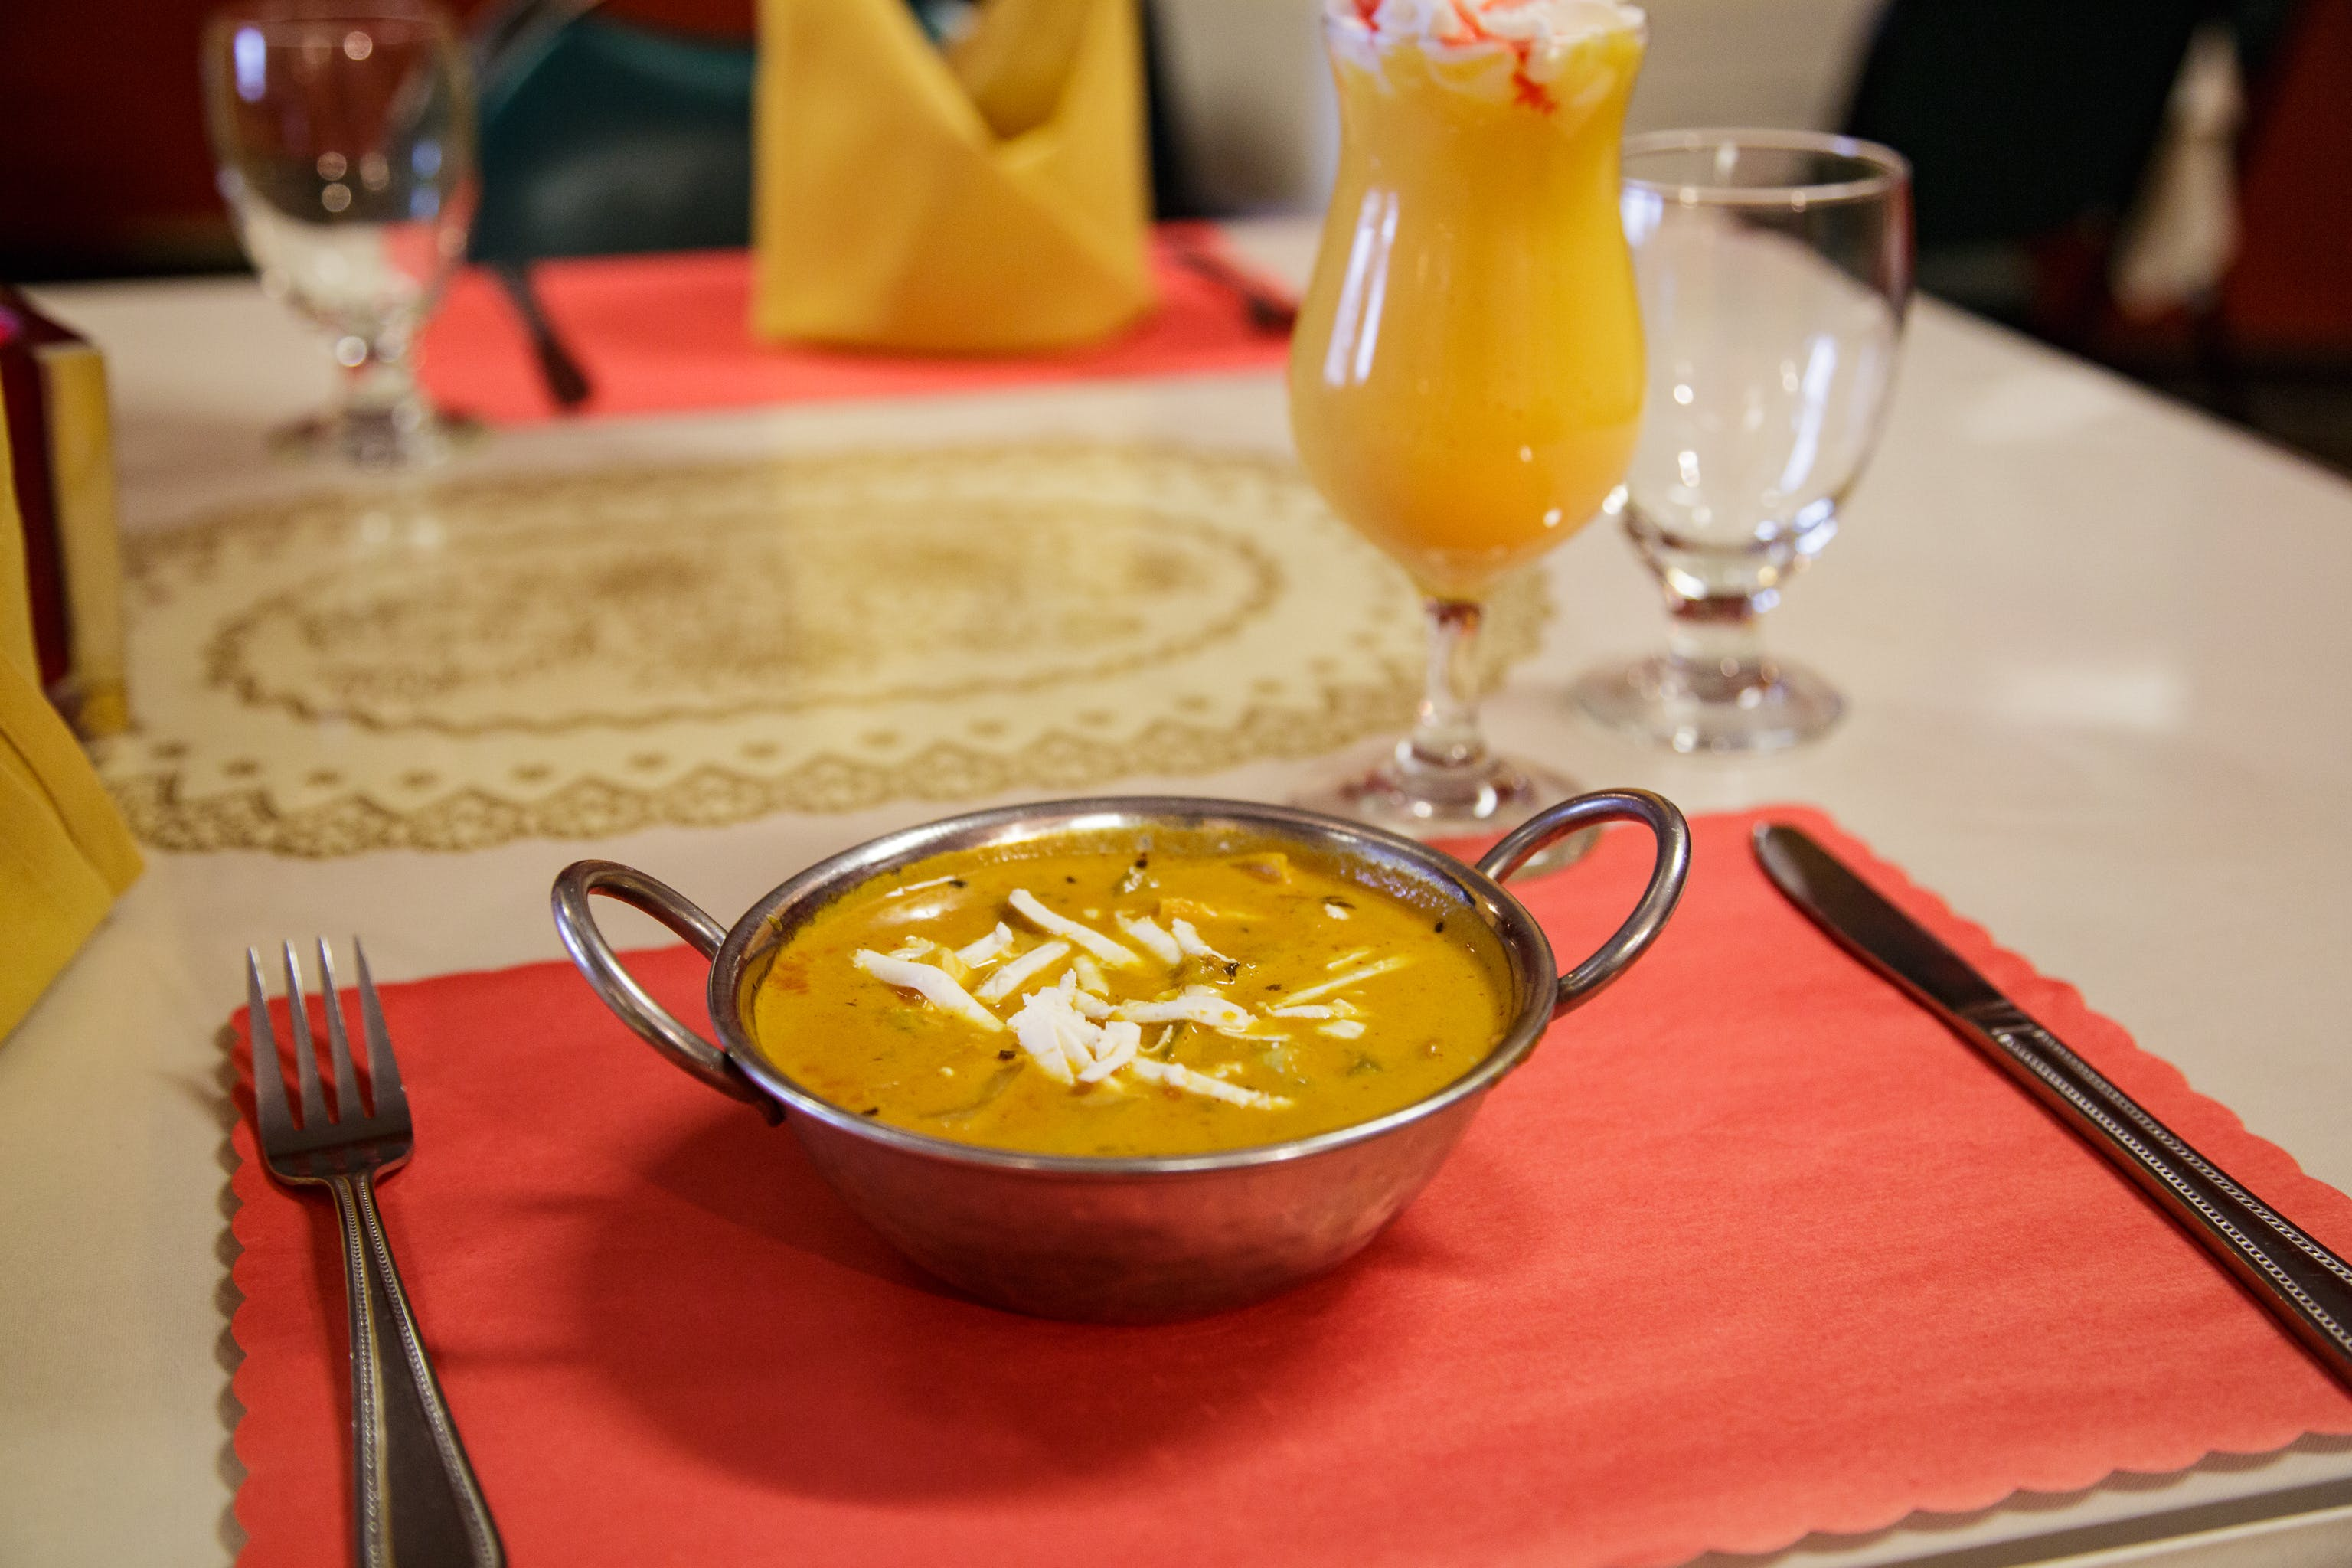 4. Chicken Tikka Masala from Maharana Restaurant in Madison, WI